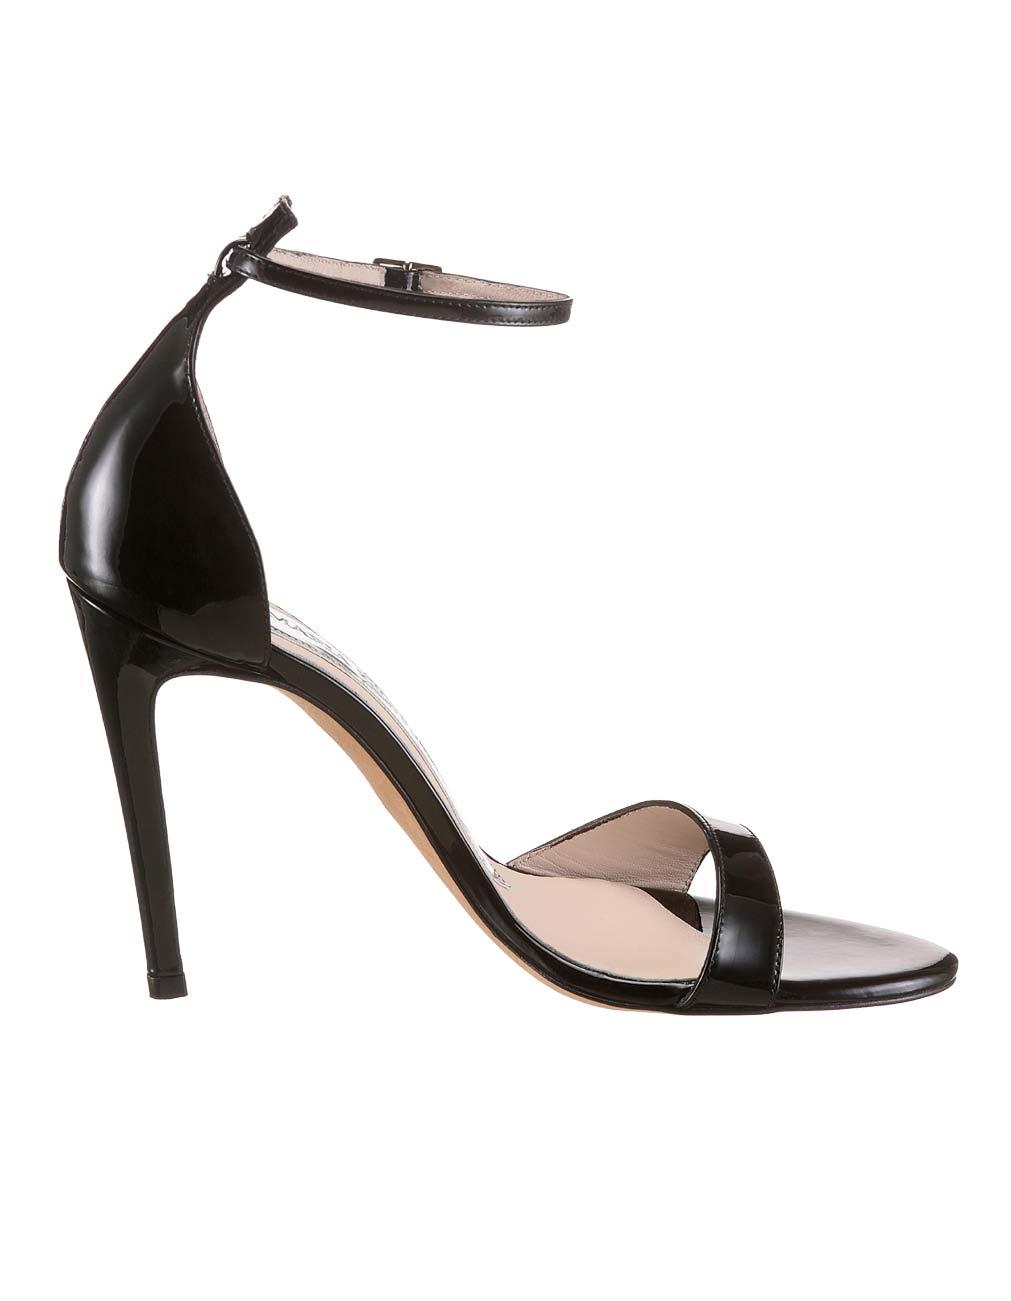 gelbes Sommerkleid - schwarze Schuhe passen perfekt